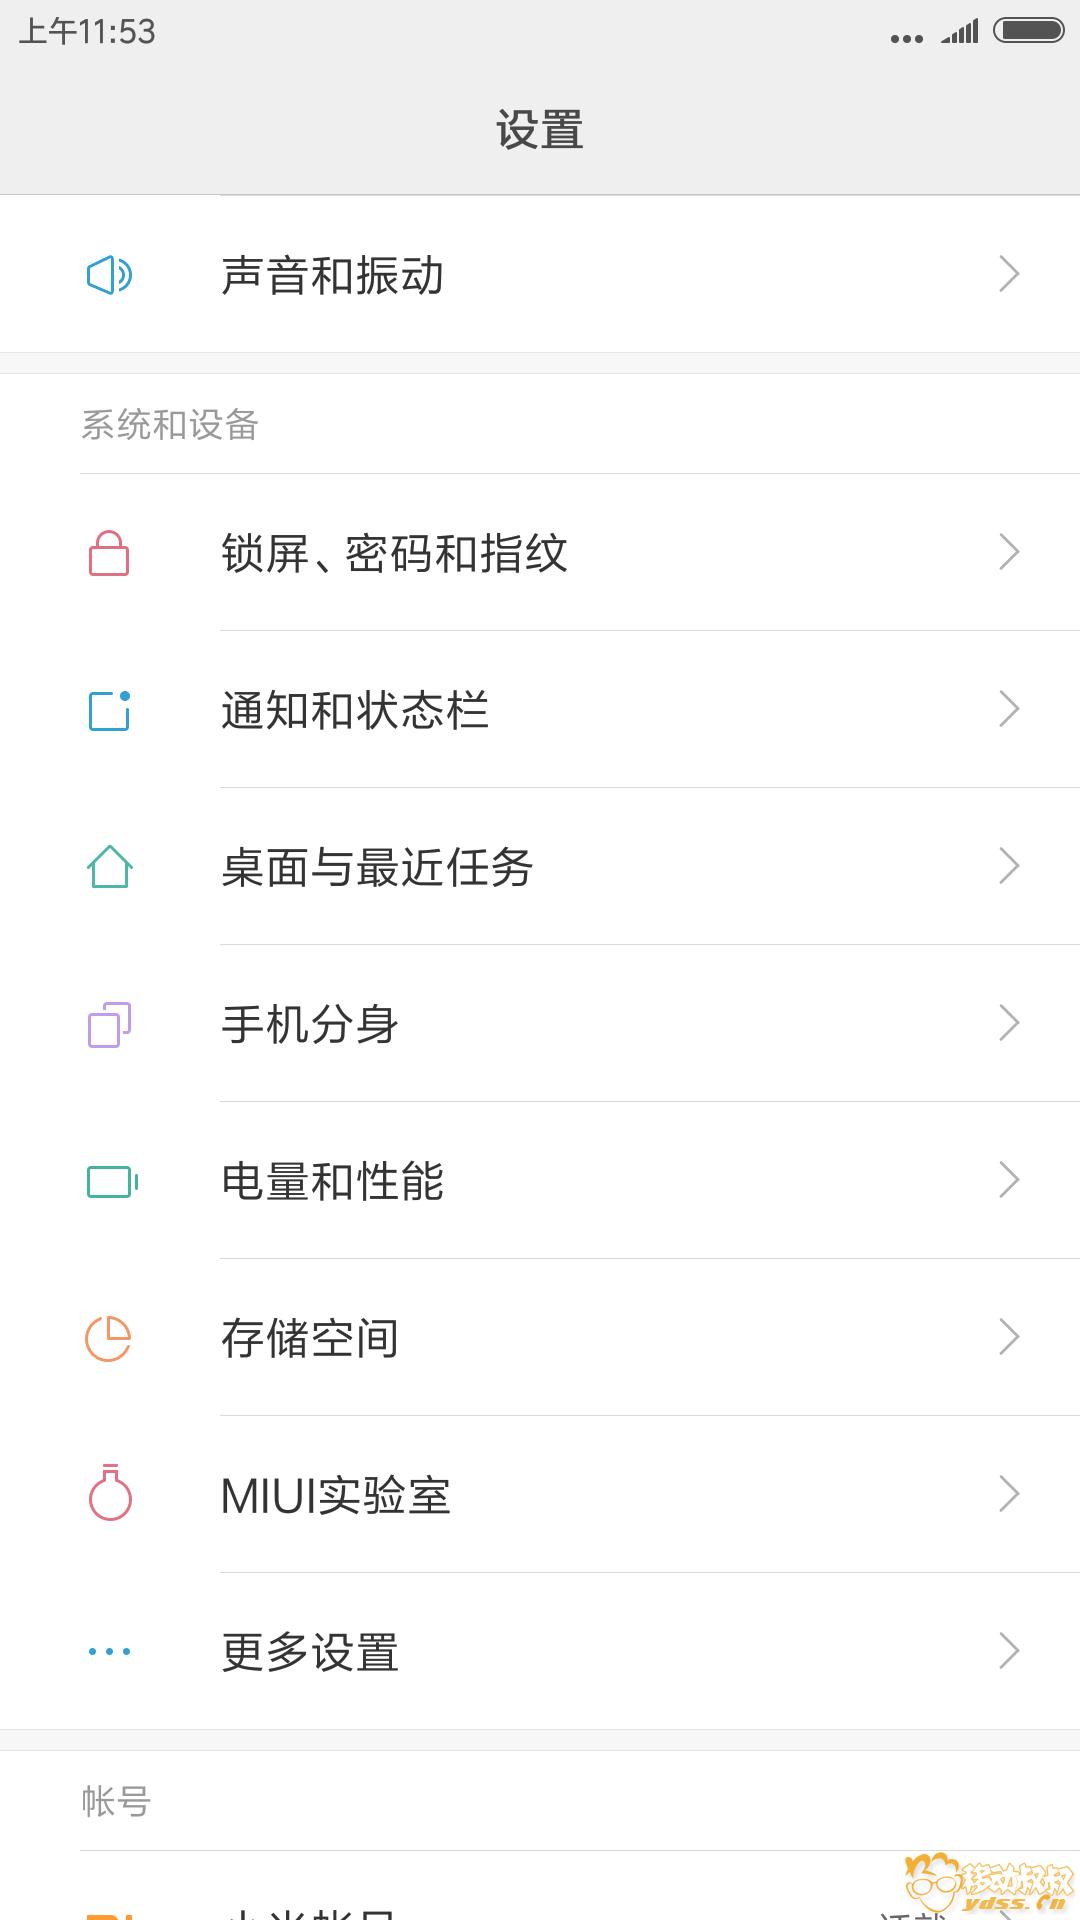 Screenshot_2017-10-09-11-53-37-276_com.android.settings.png